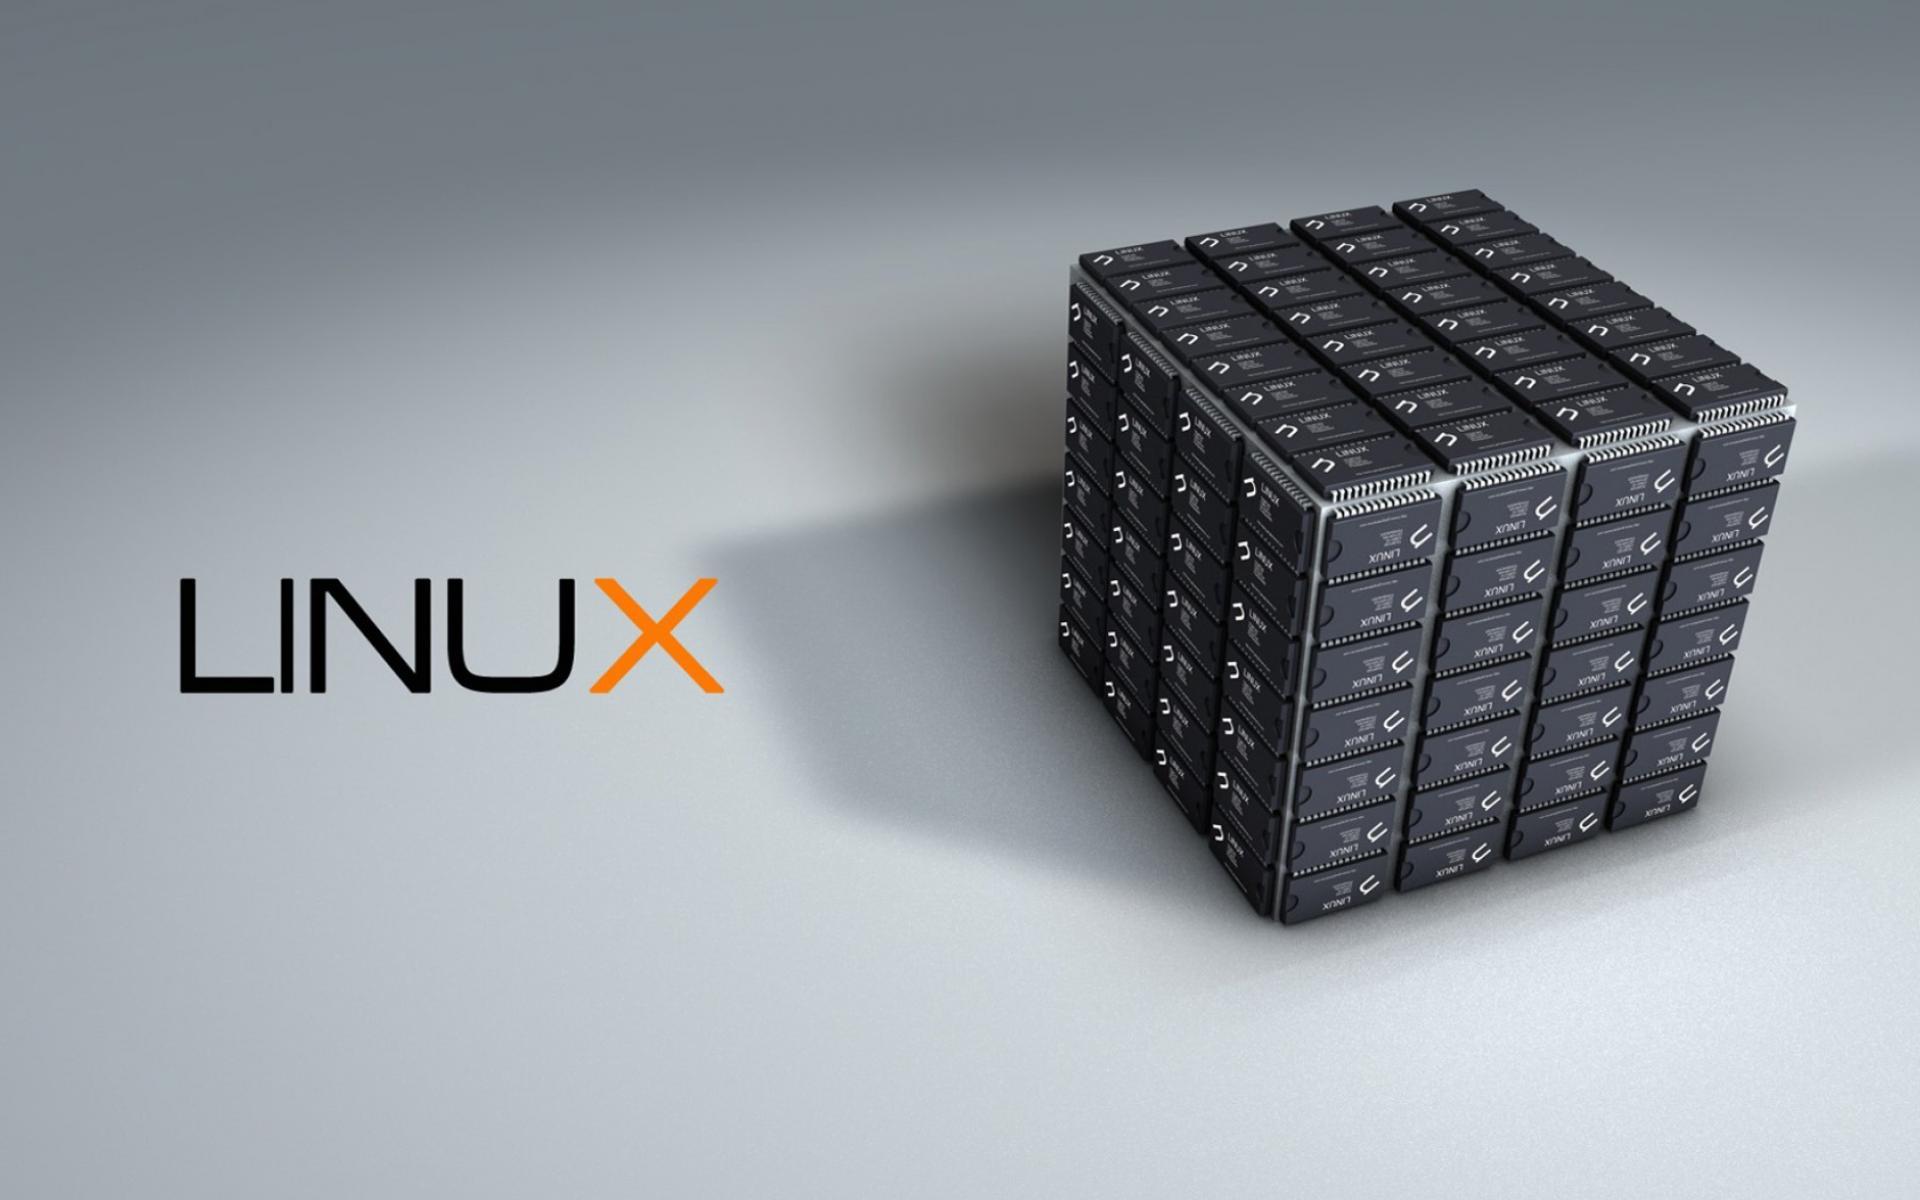 Linux GPU Cube